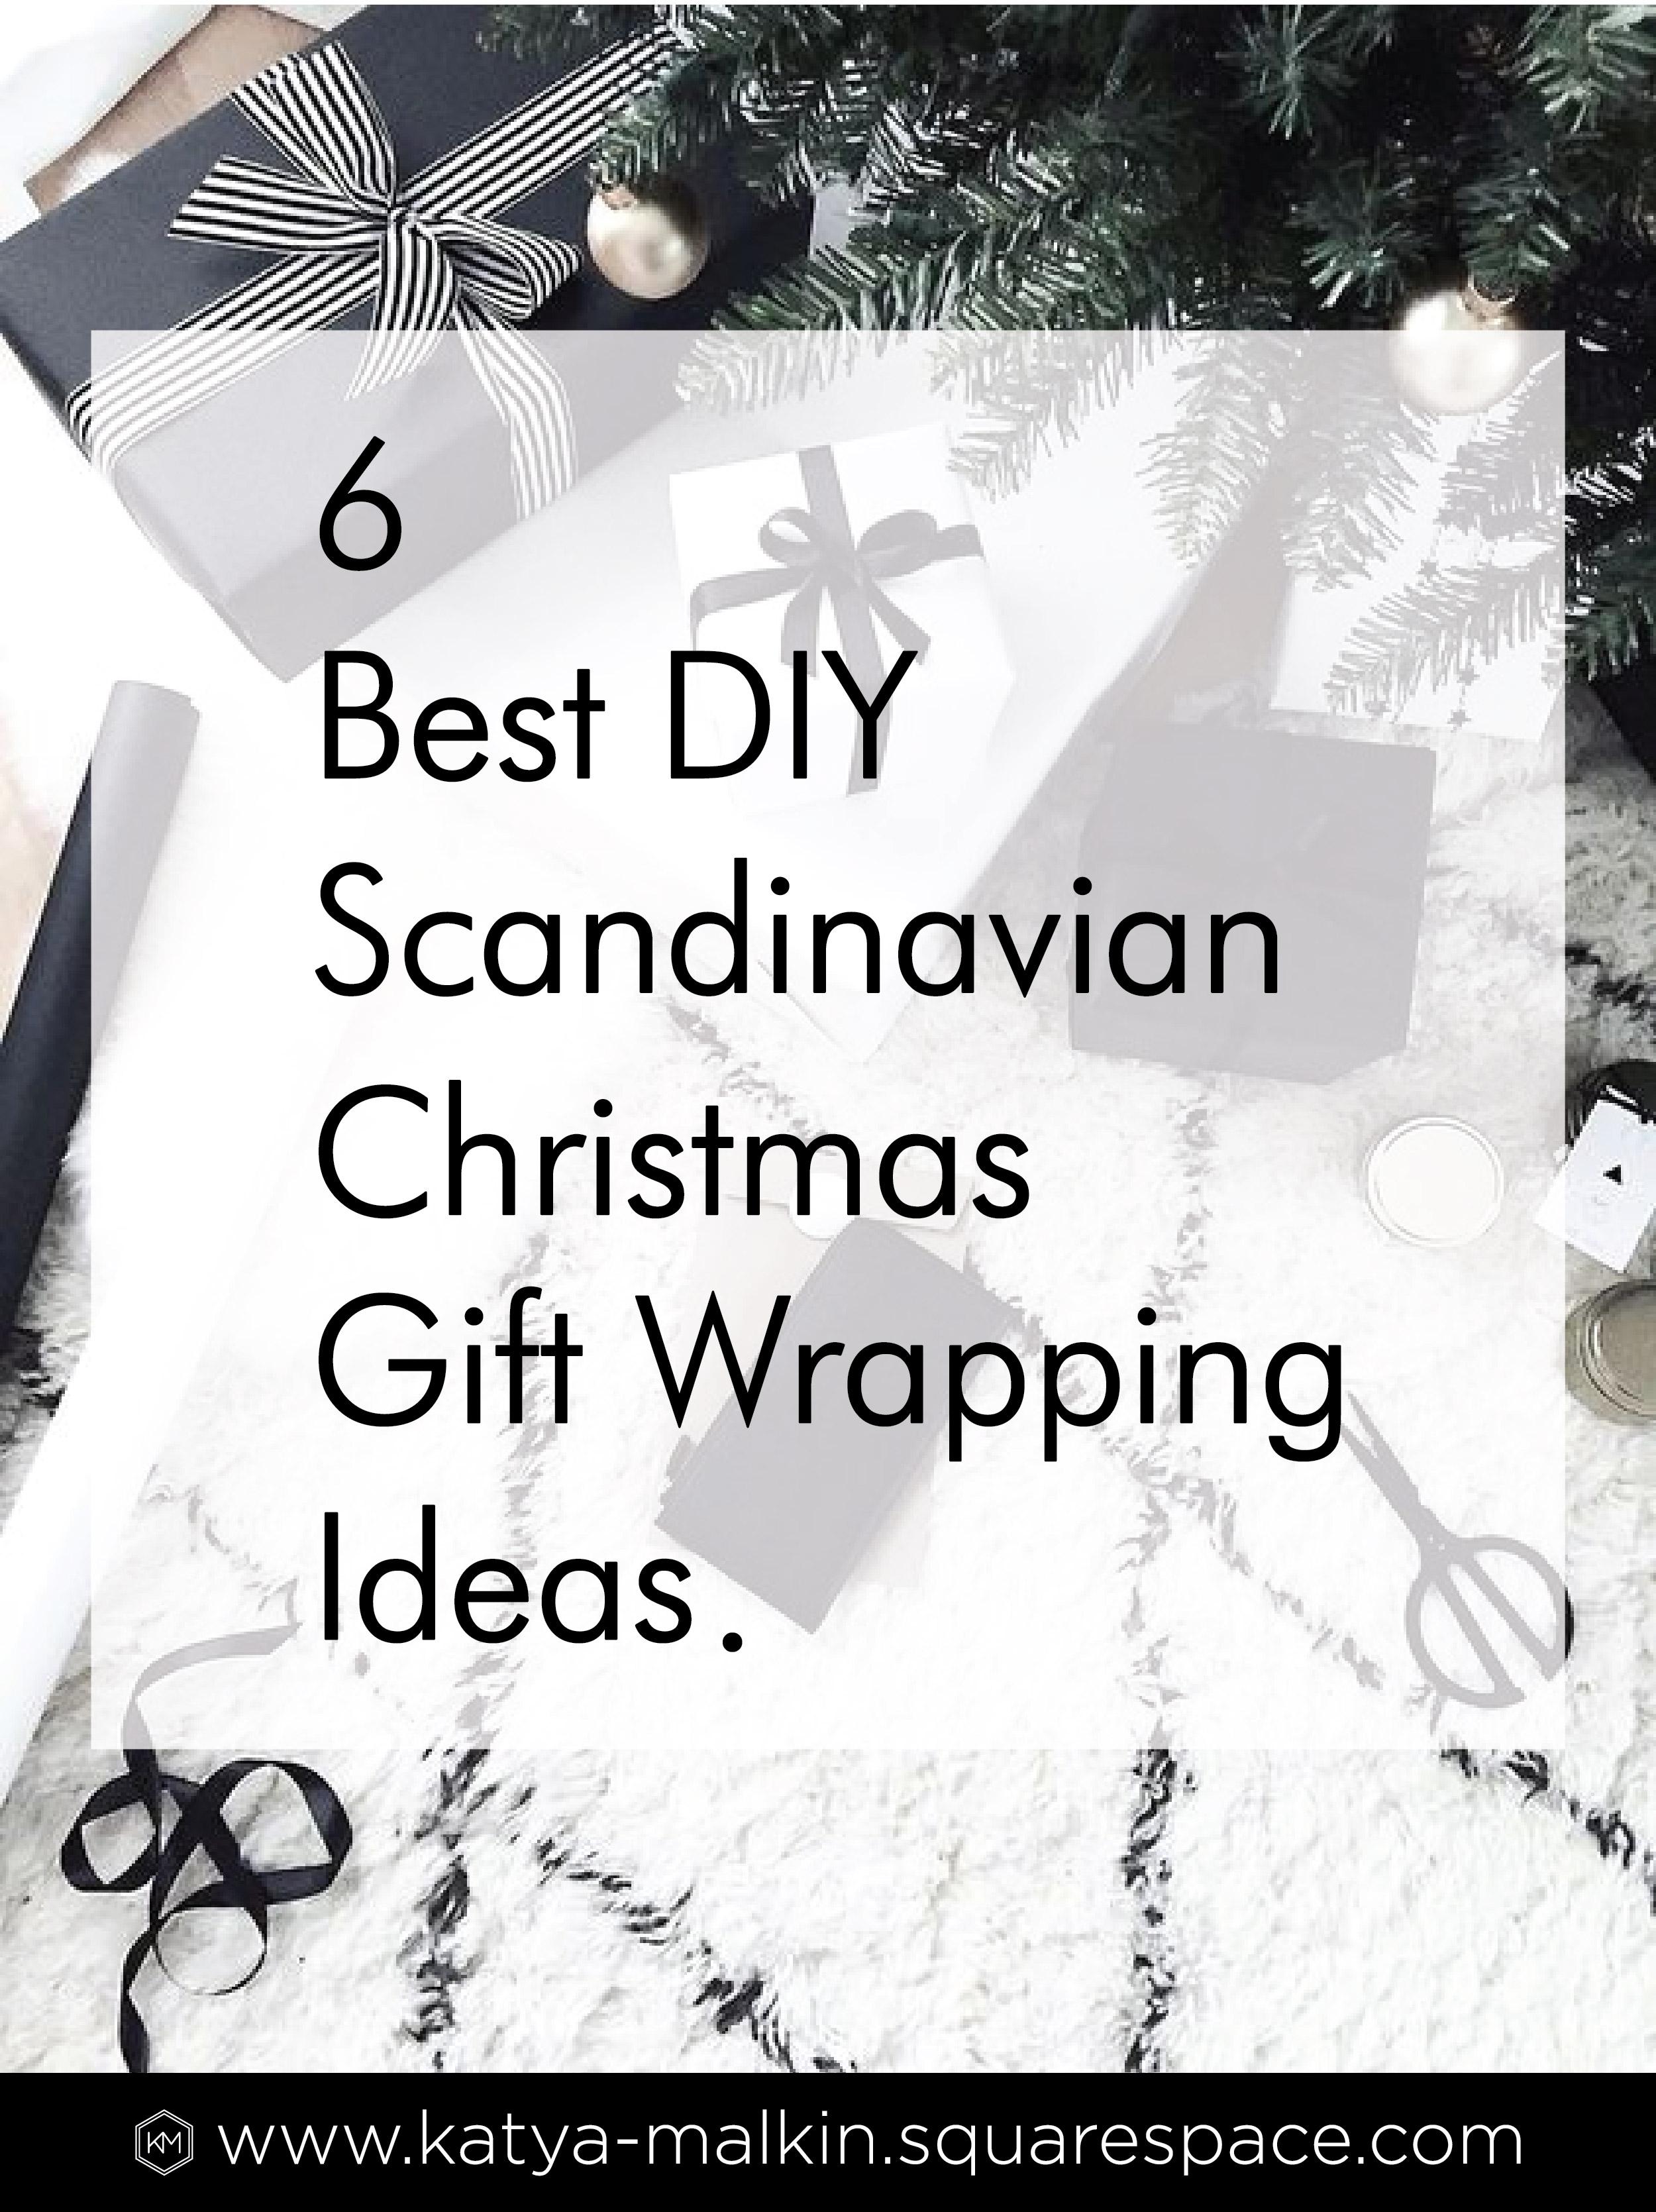 DIY Scandinavian Christmas Gift Wrapping Ideas